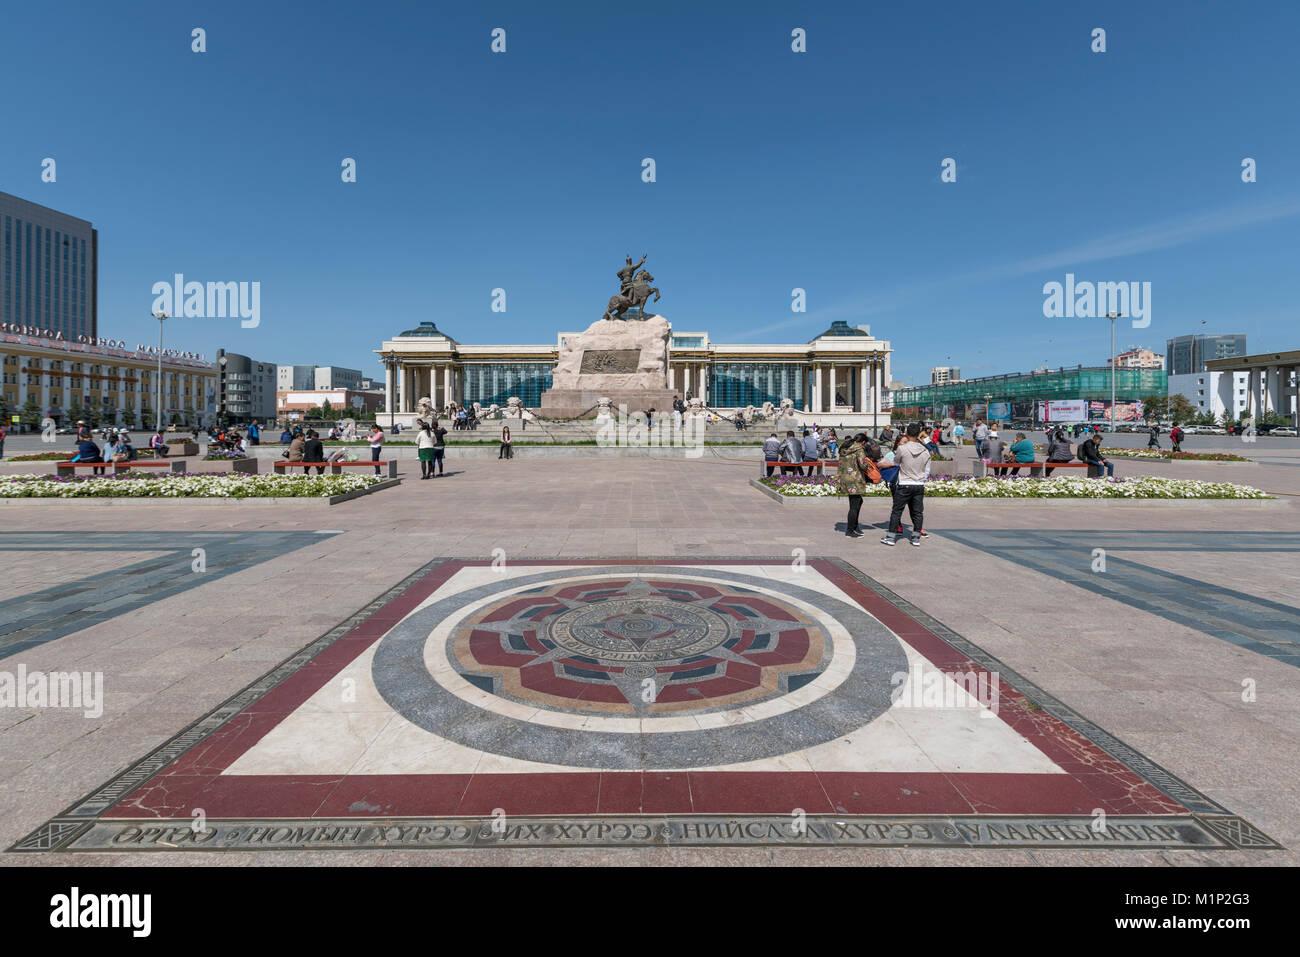 Los turistas en Sukhbaatar Square con Damdin Sukhbaatar estatua, Ulan Bator, Mongolia, Asia Central, África Imagen De Stock